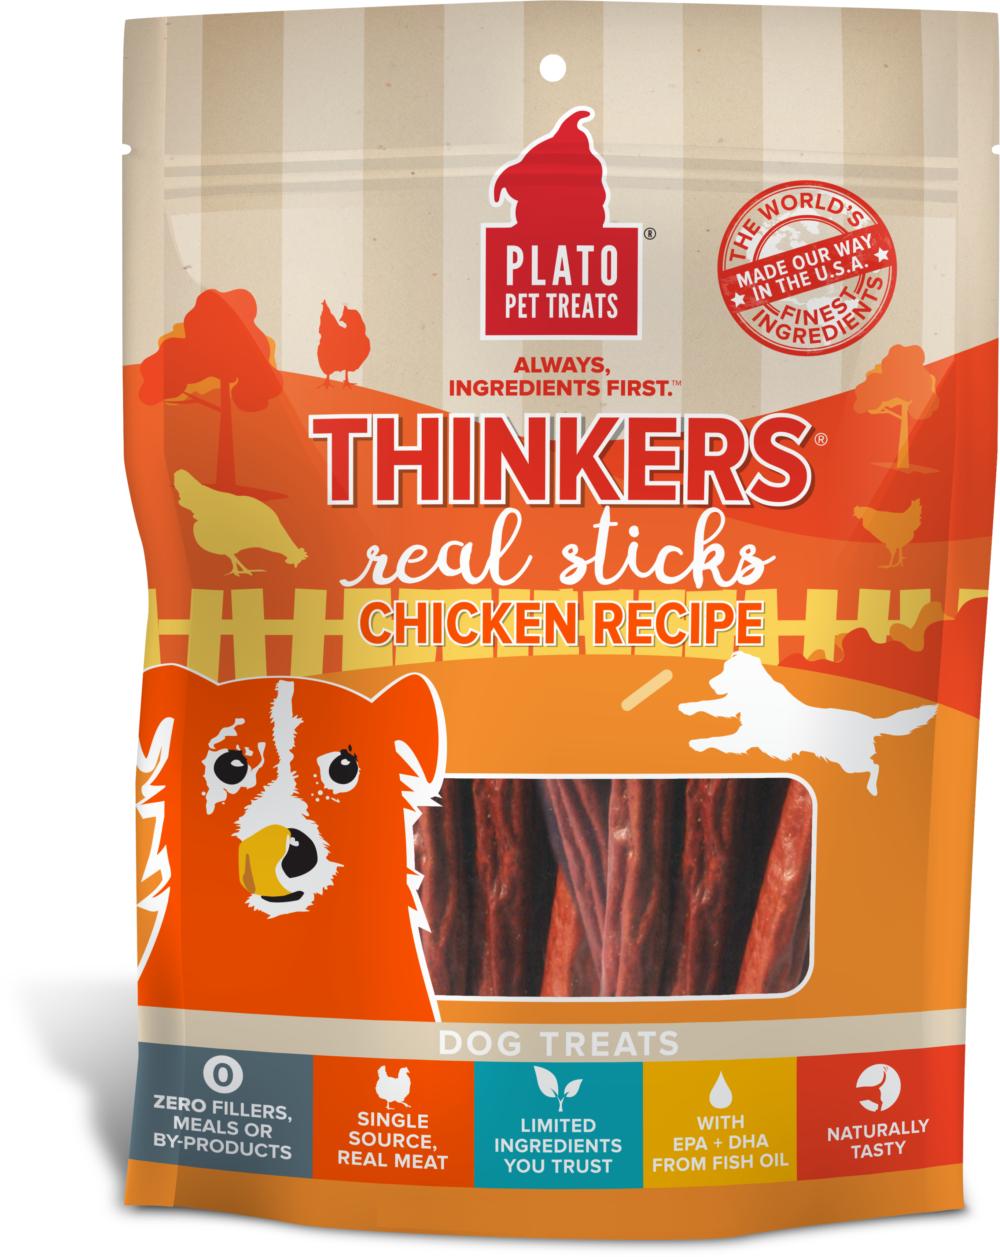 Plato Thinkers Chicken Recipe Dog Treats Image